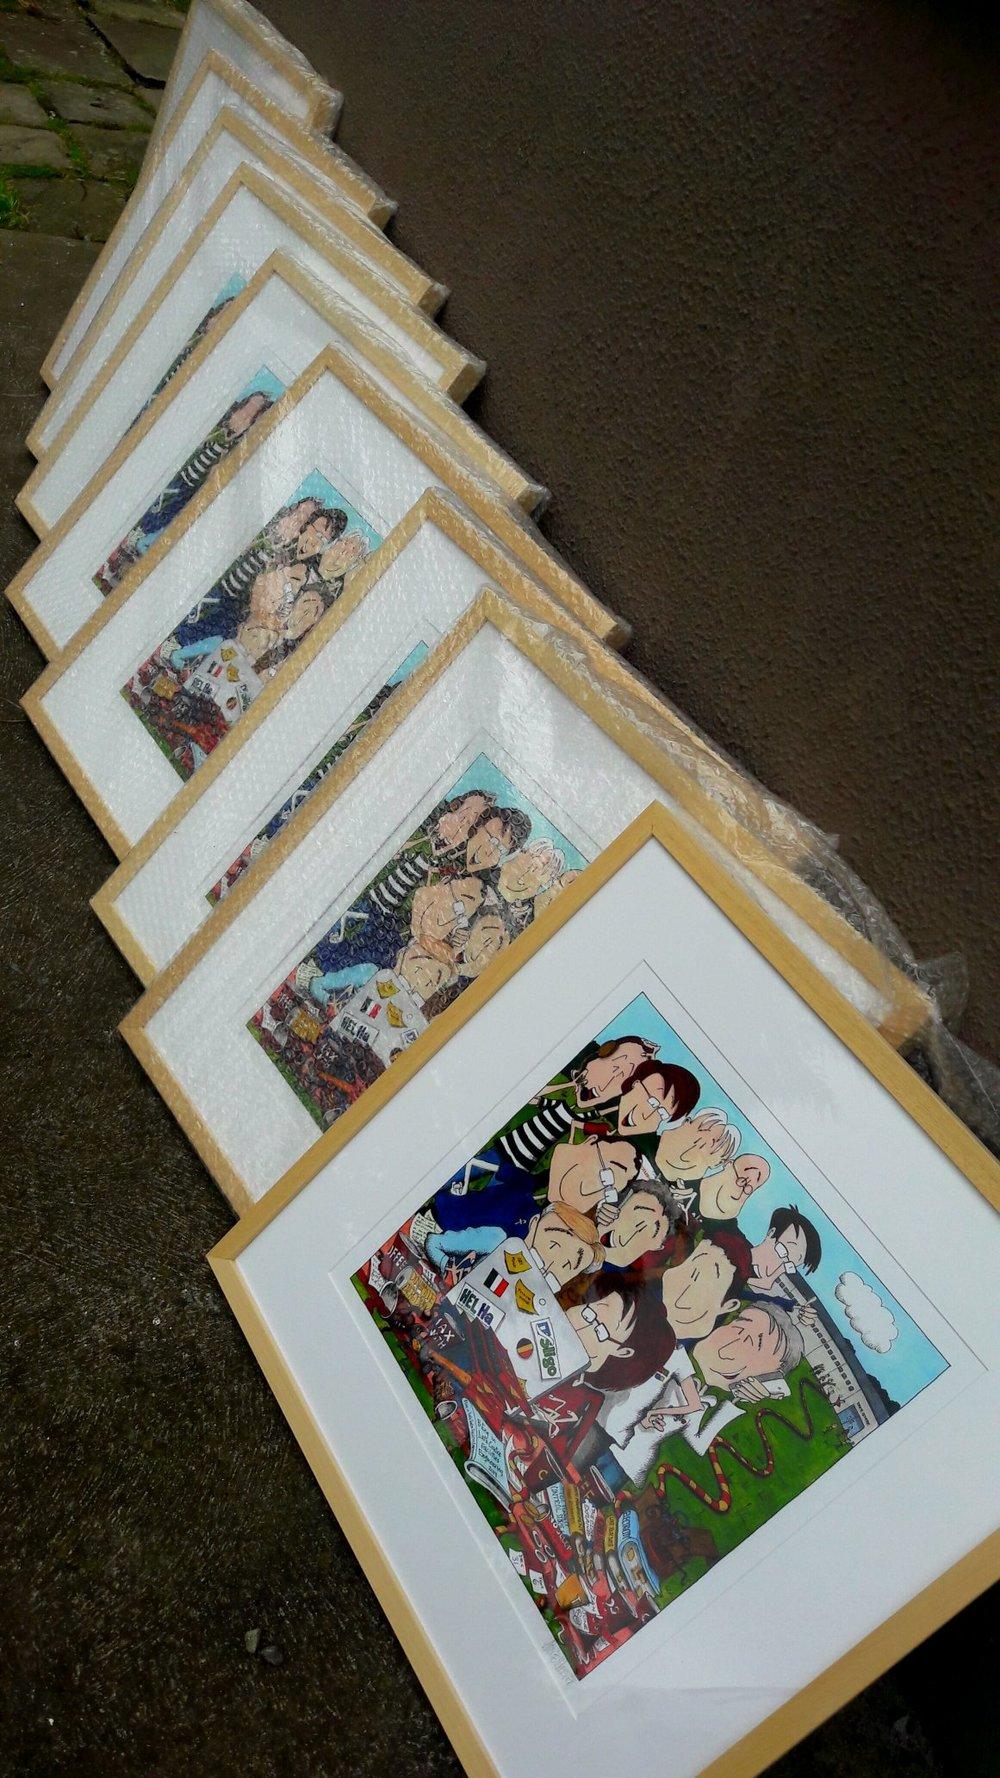 Framed Sligo IT prints ready for presenting